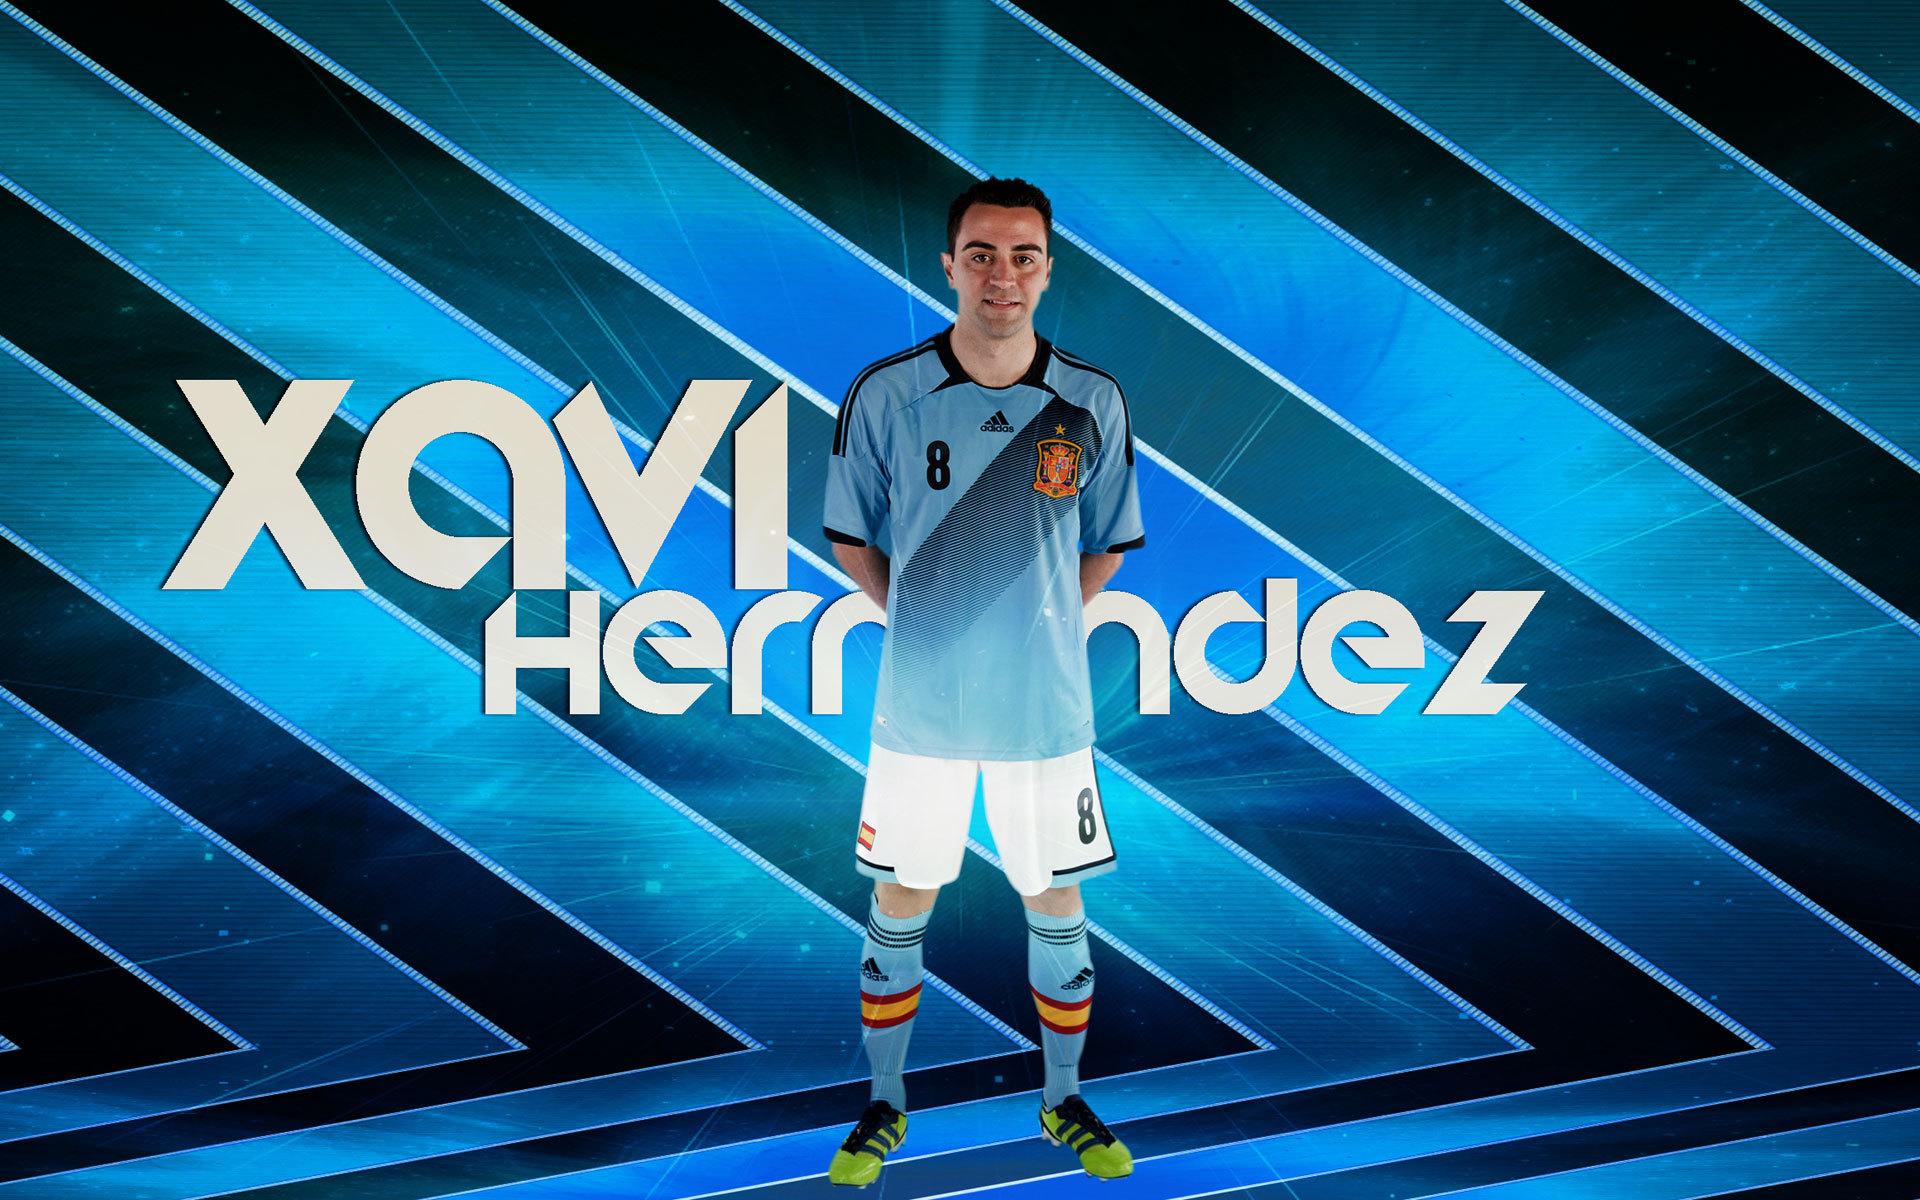 The football player of barcelona xavi hernandez wallpapers and the football player of barcelona xavi hernandez voltagebd Image collections